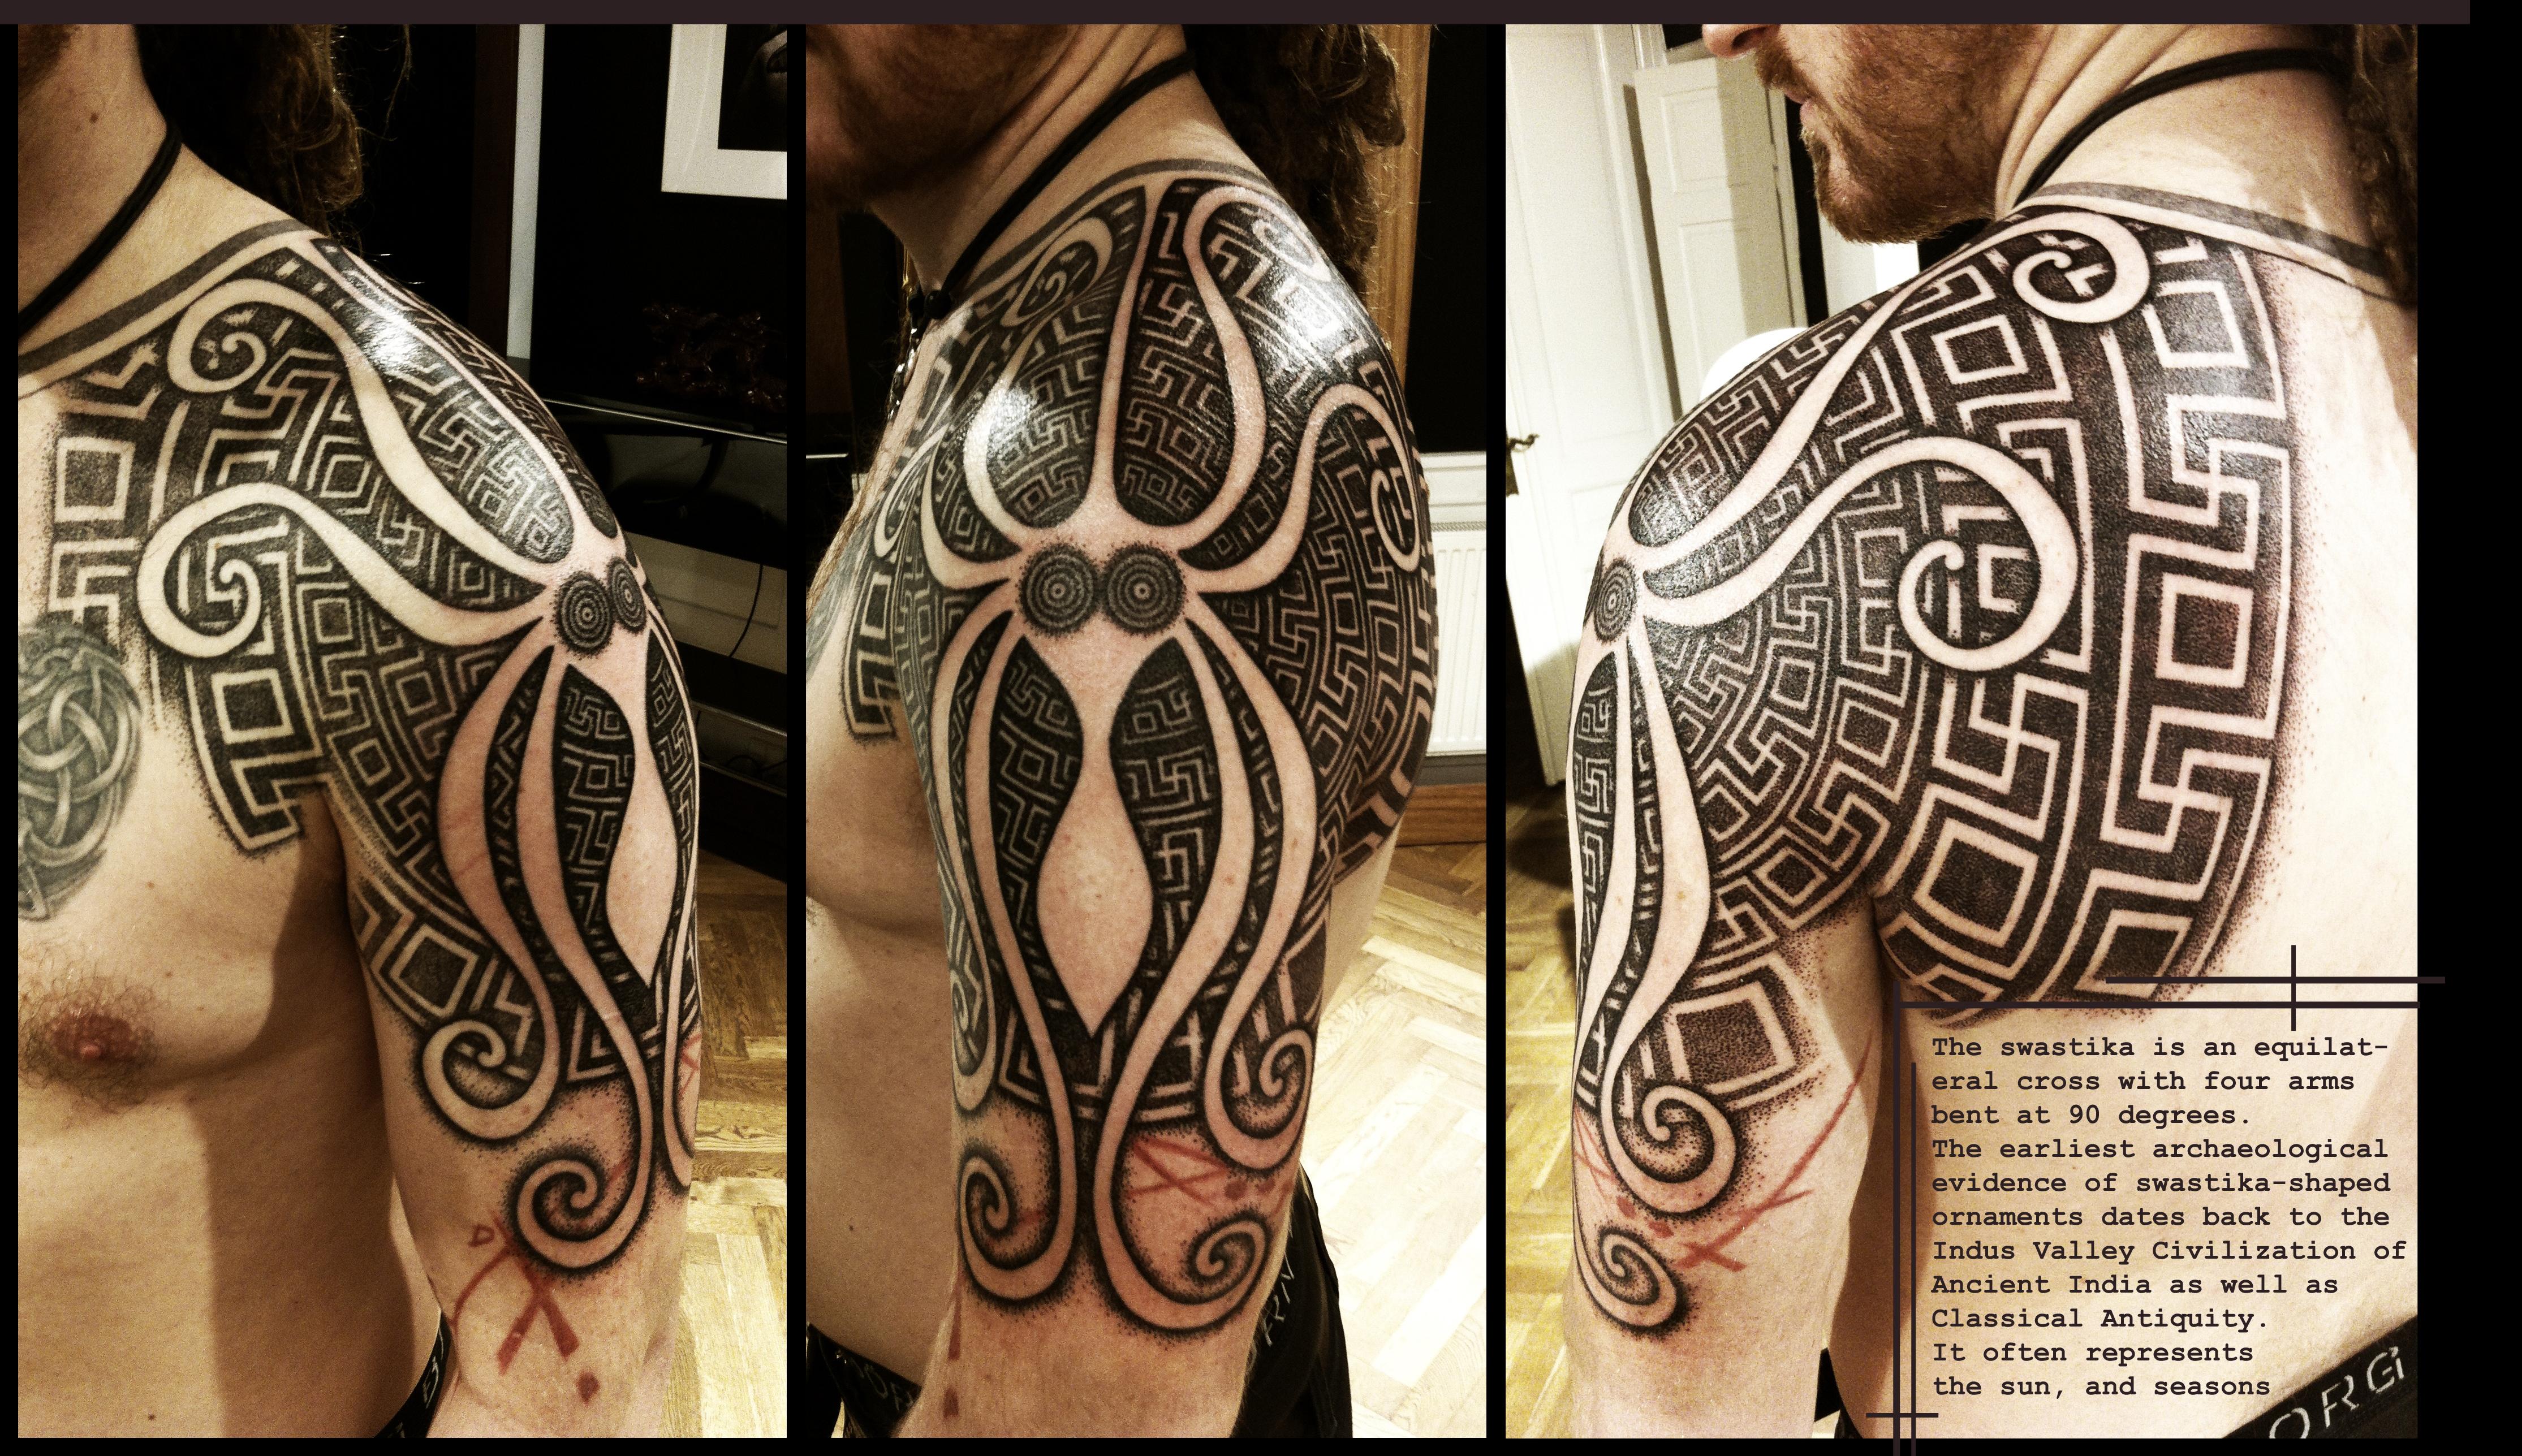 greek tattoos design ideas pictures gallery. Black Bedroom Furniture Sets. Home Design Ideas